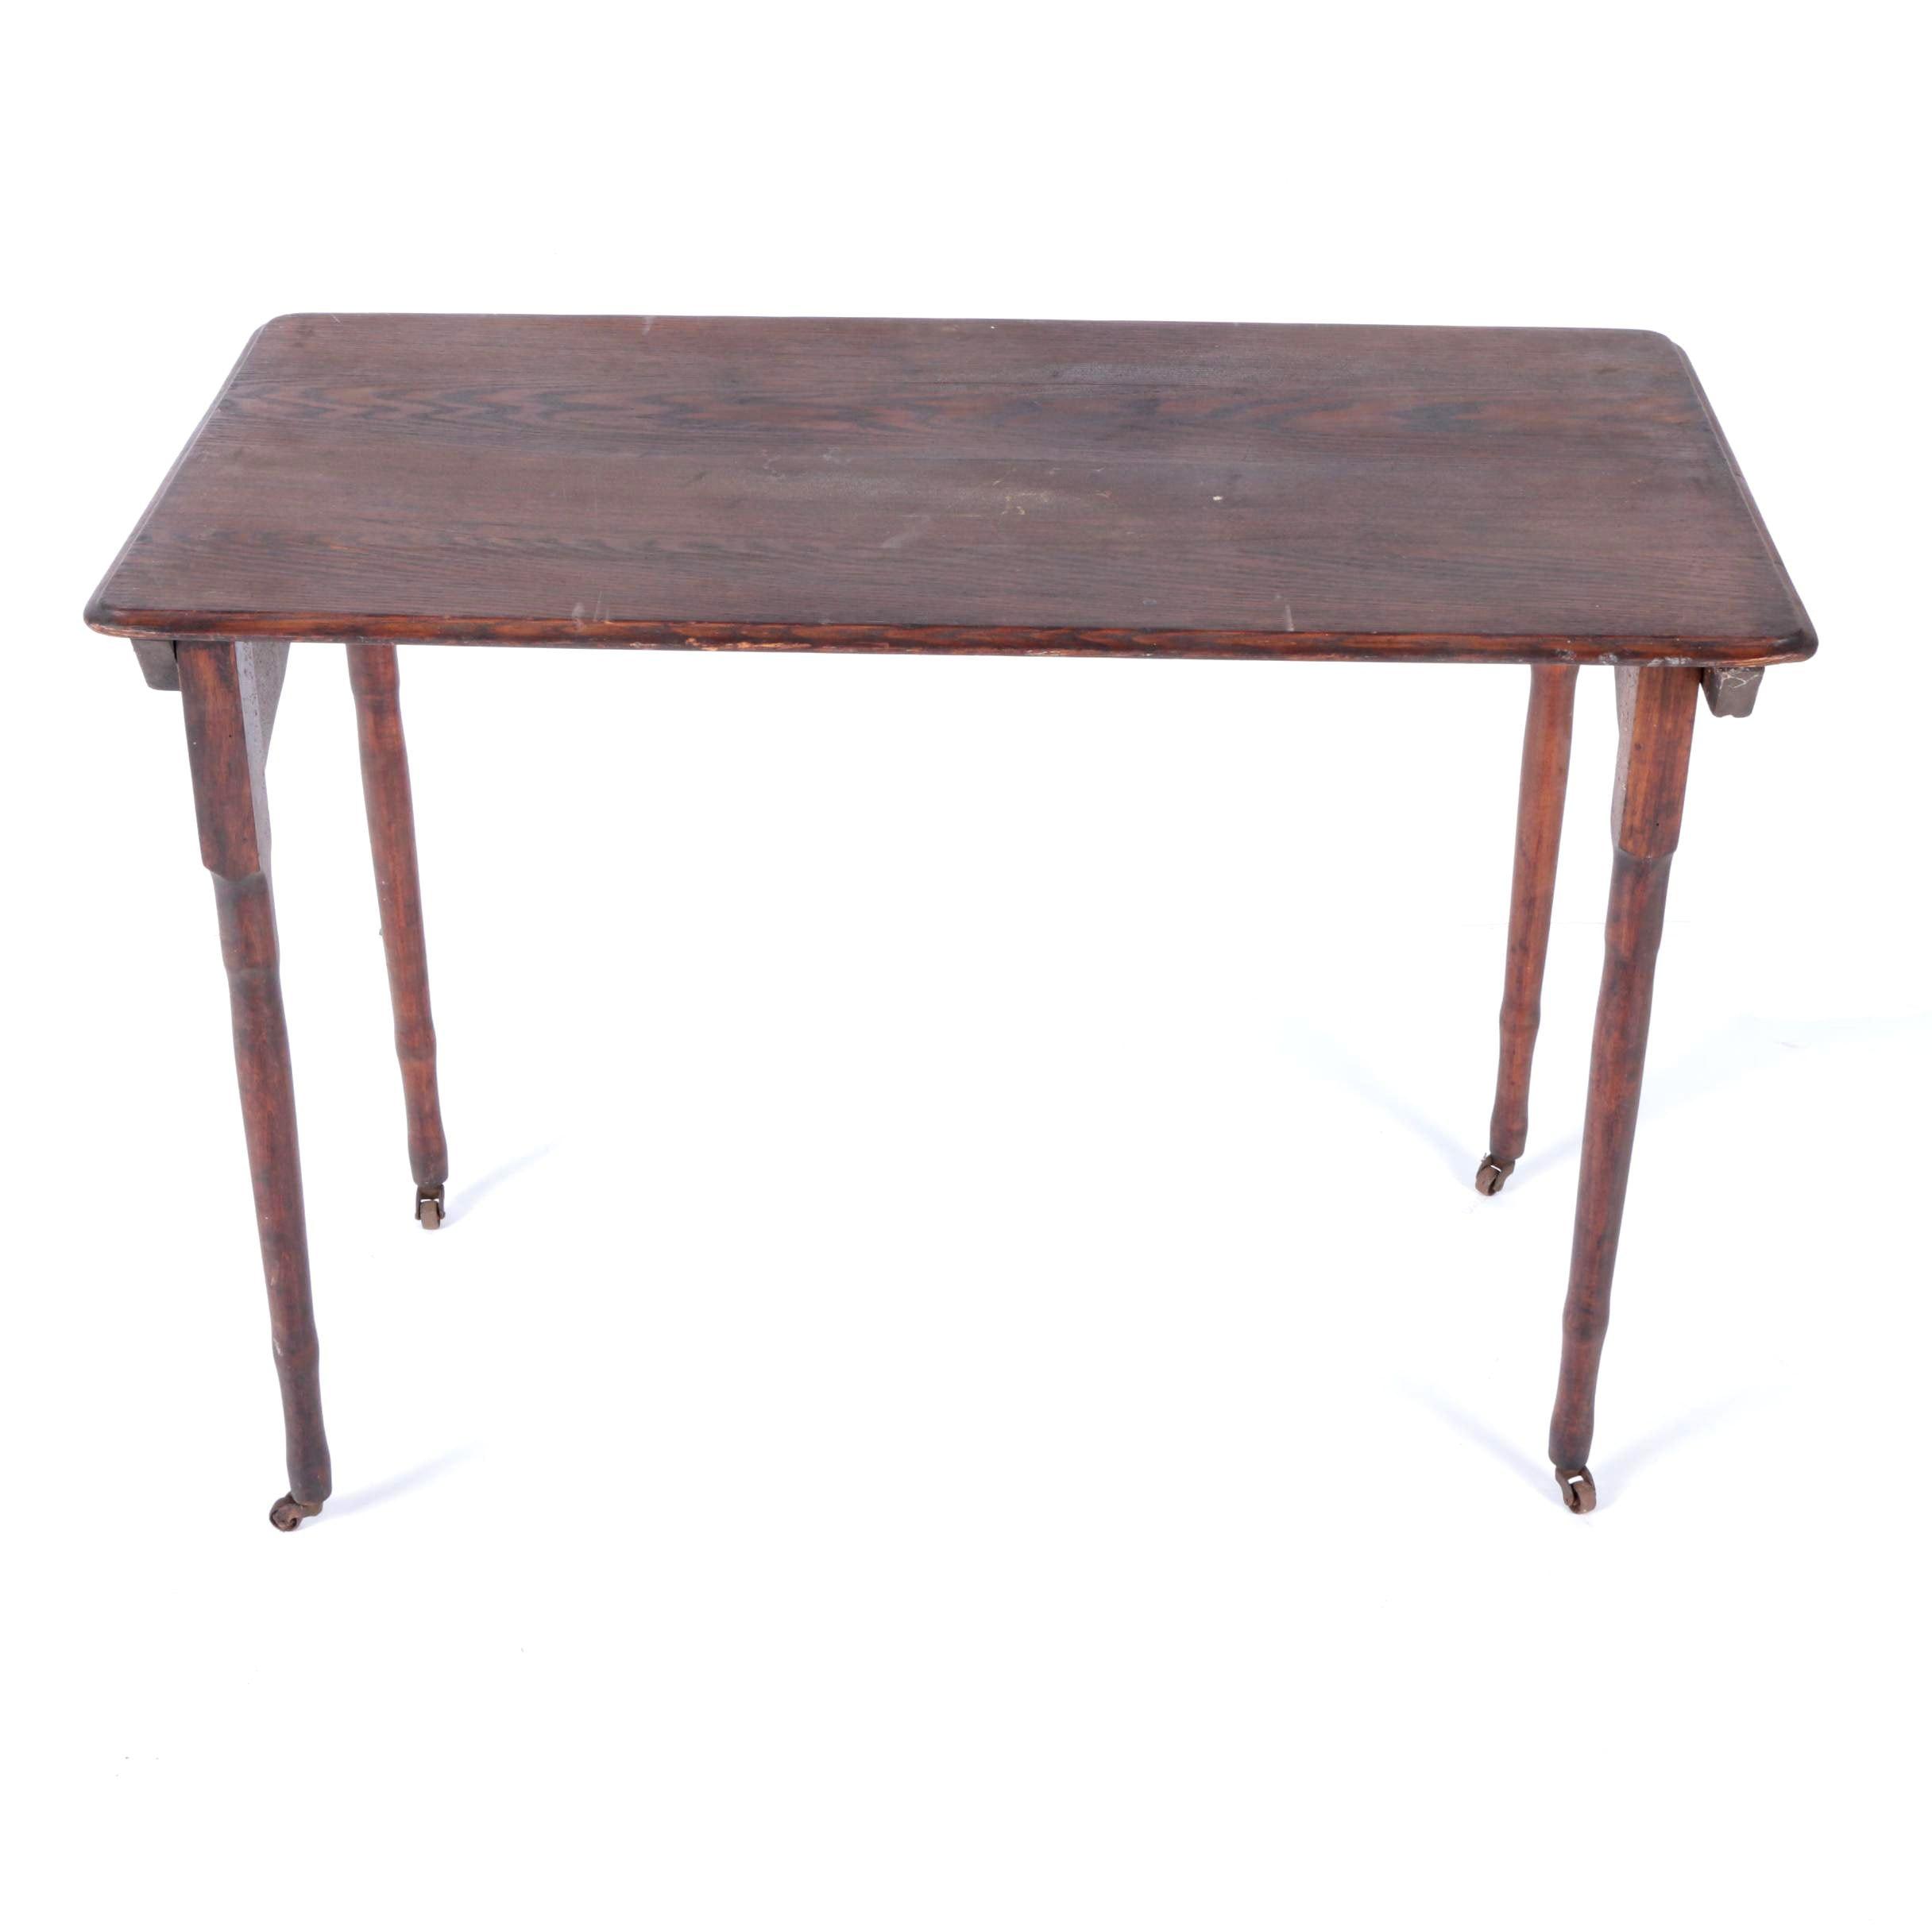 Antique Oak Folding Table